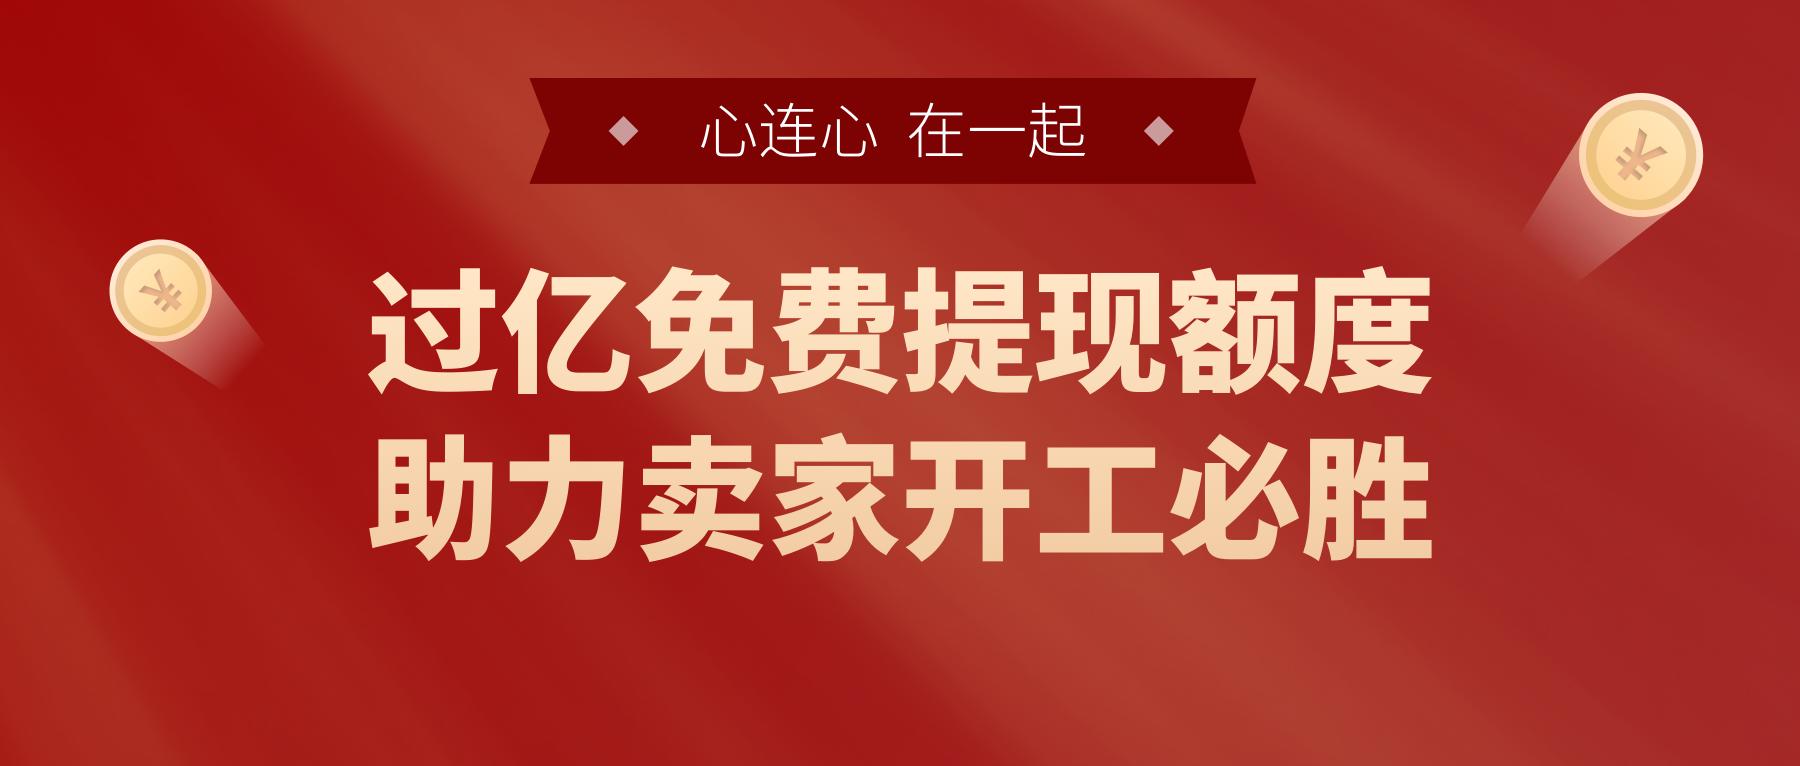 https://global.lianlianpay.com/activity/2020start?invitecode=3C13BN&utm_campaign=bisheng2020&utm_content=website&utm_medium=cpc